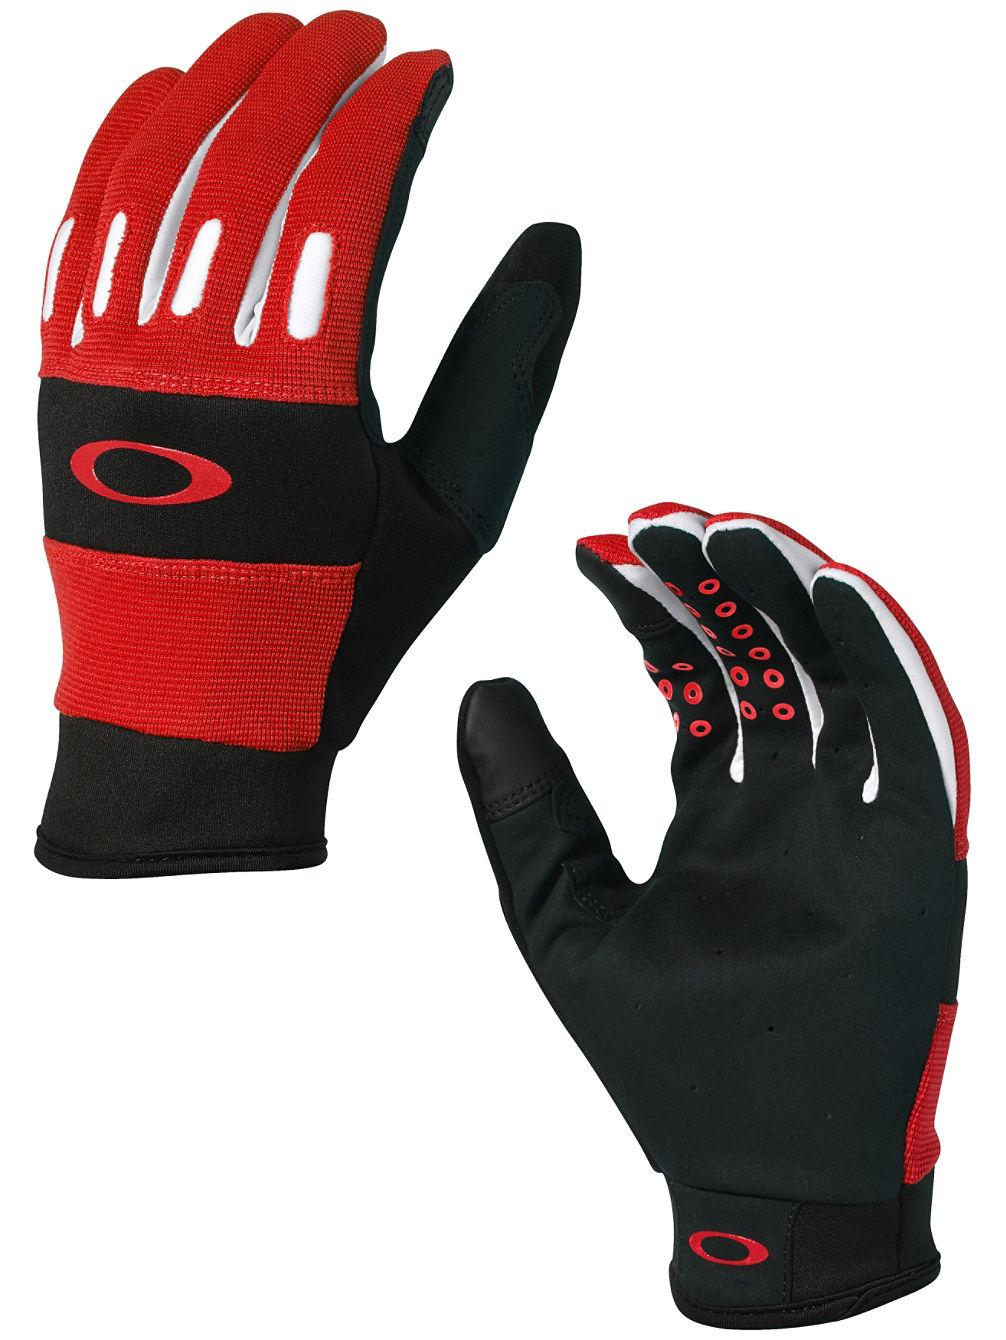 Oakley Factory 2.0 Gloves - oakley - blue-tomato.com